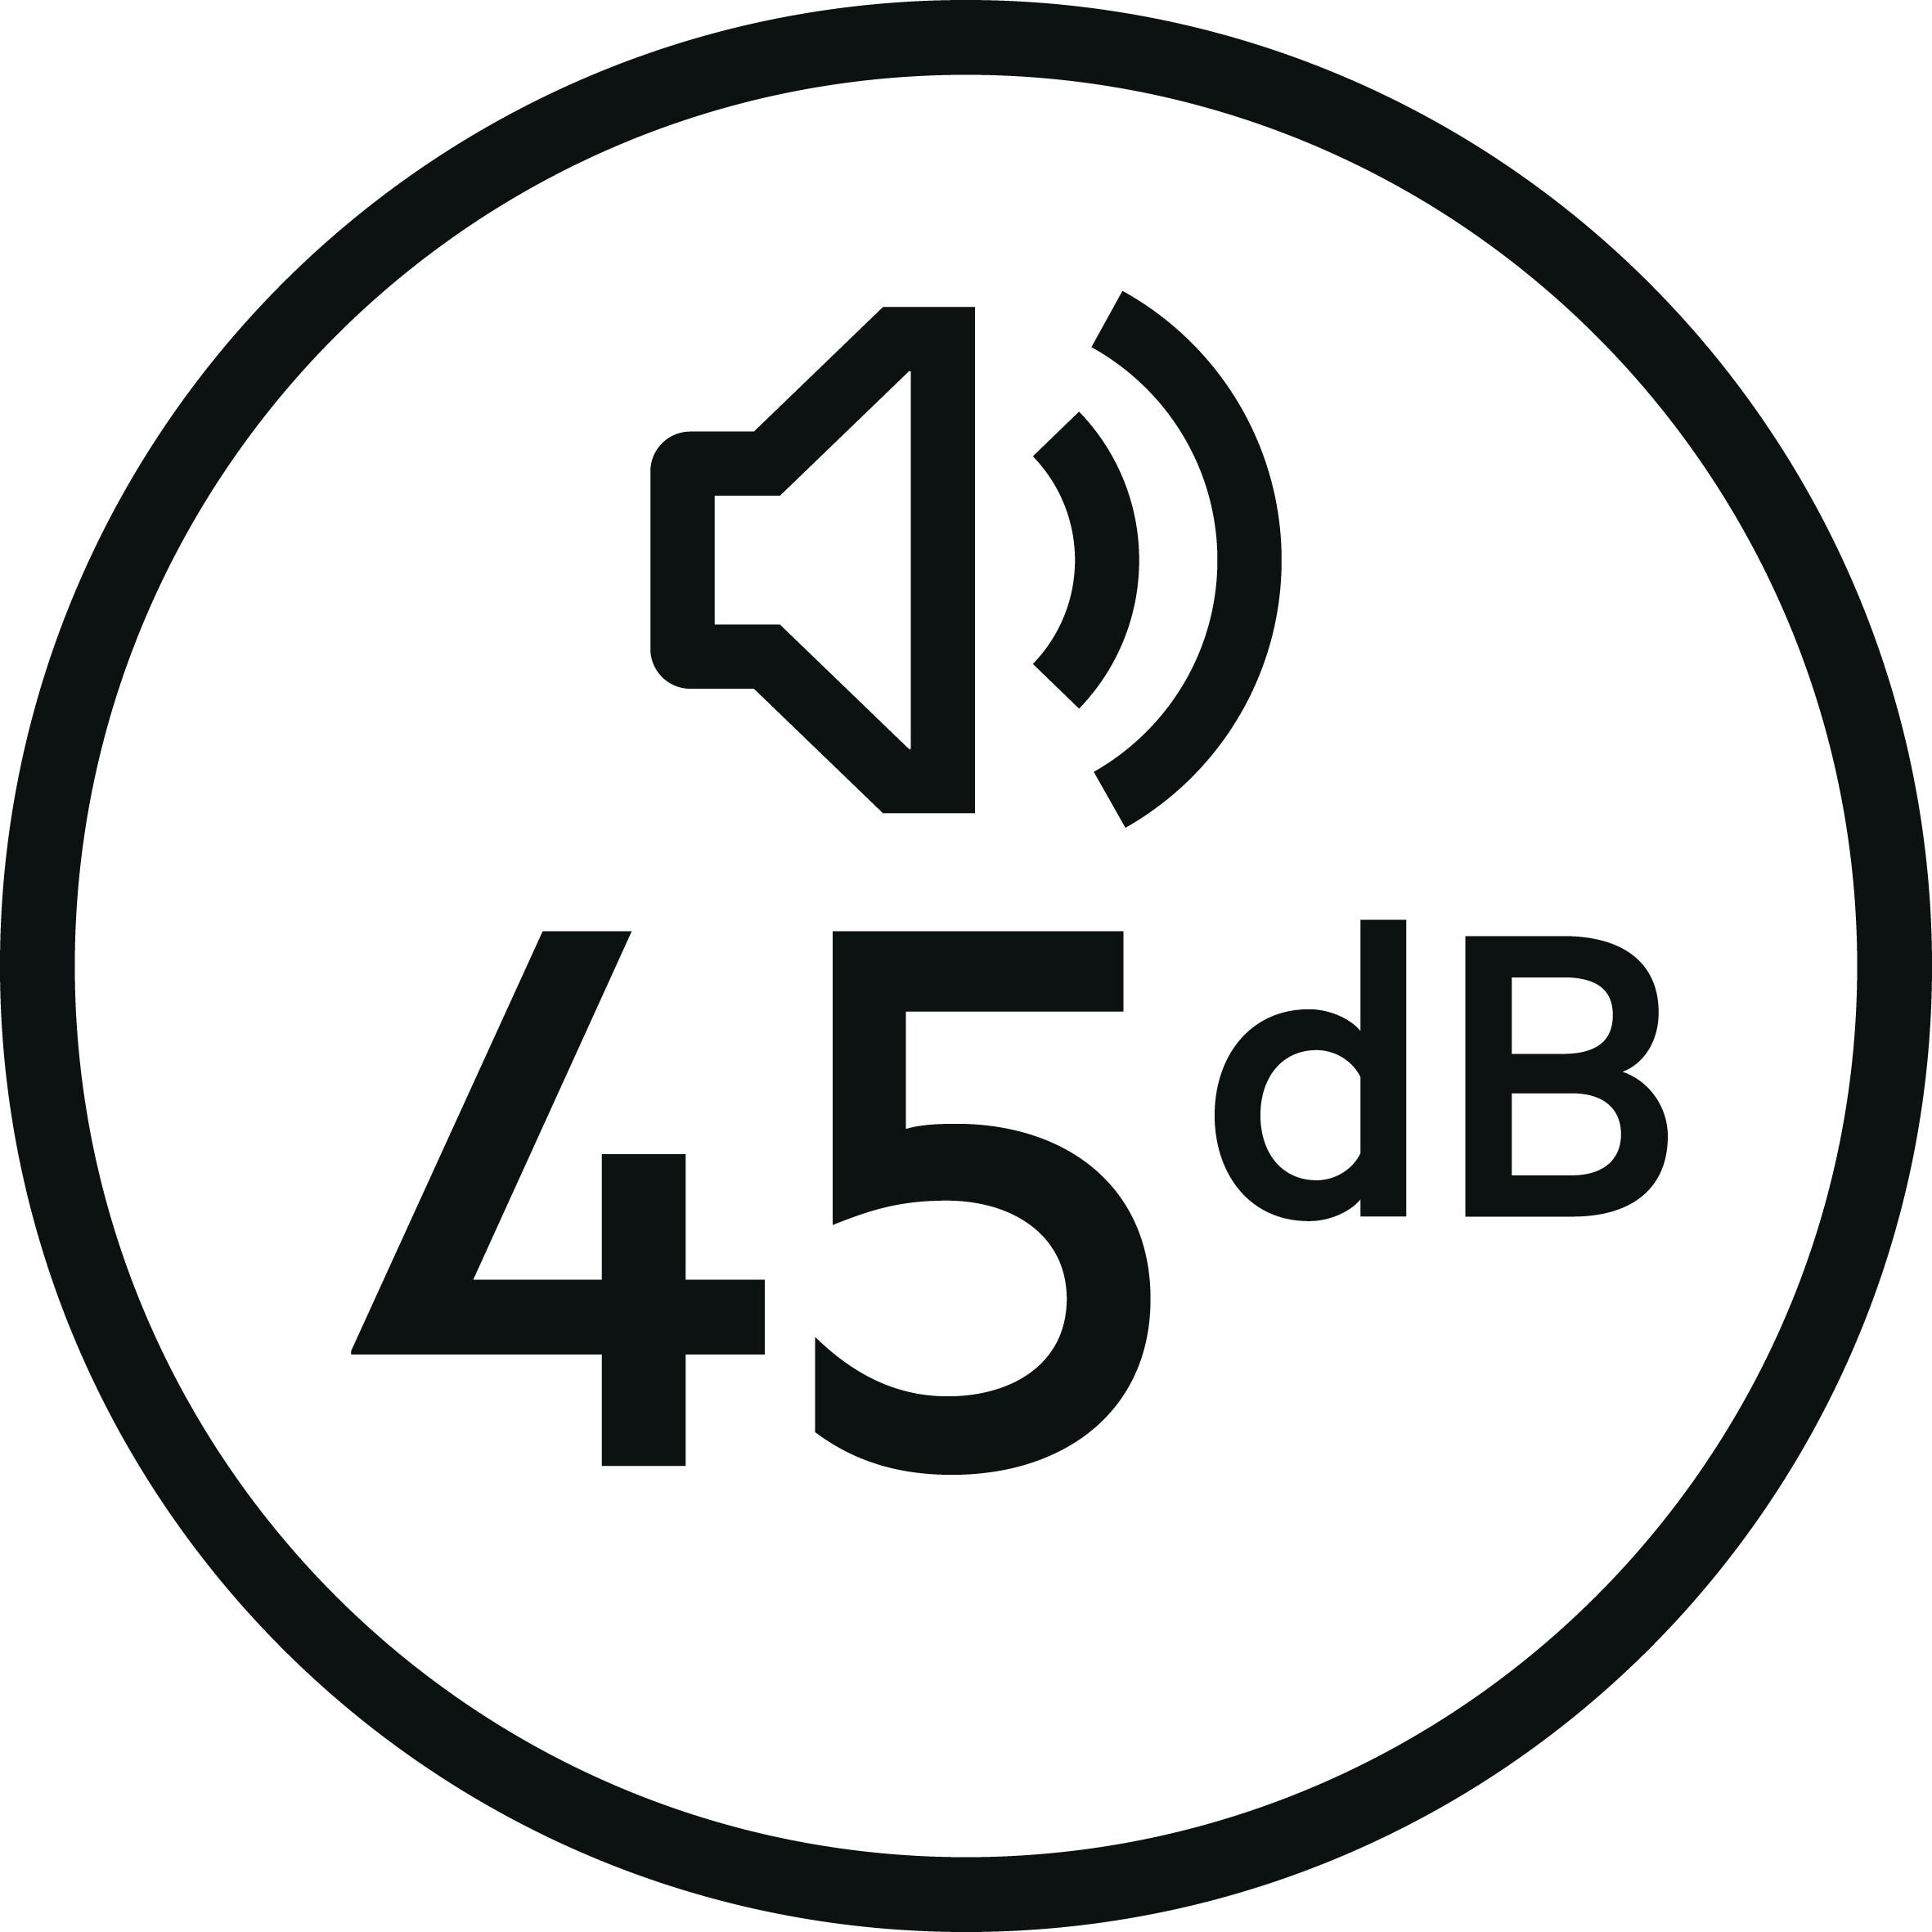 45dB-PSAAAP16PC569046.jpg